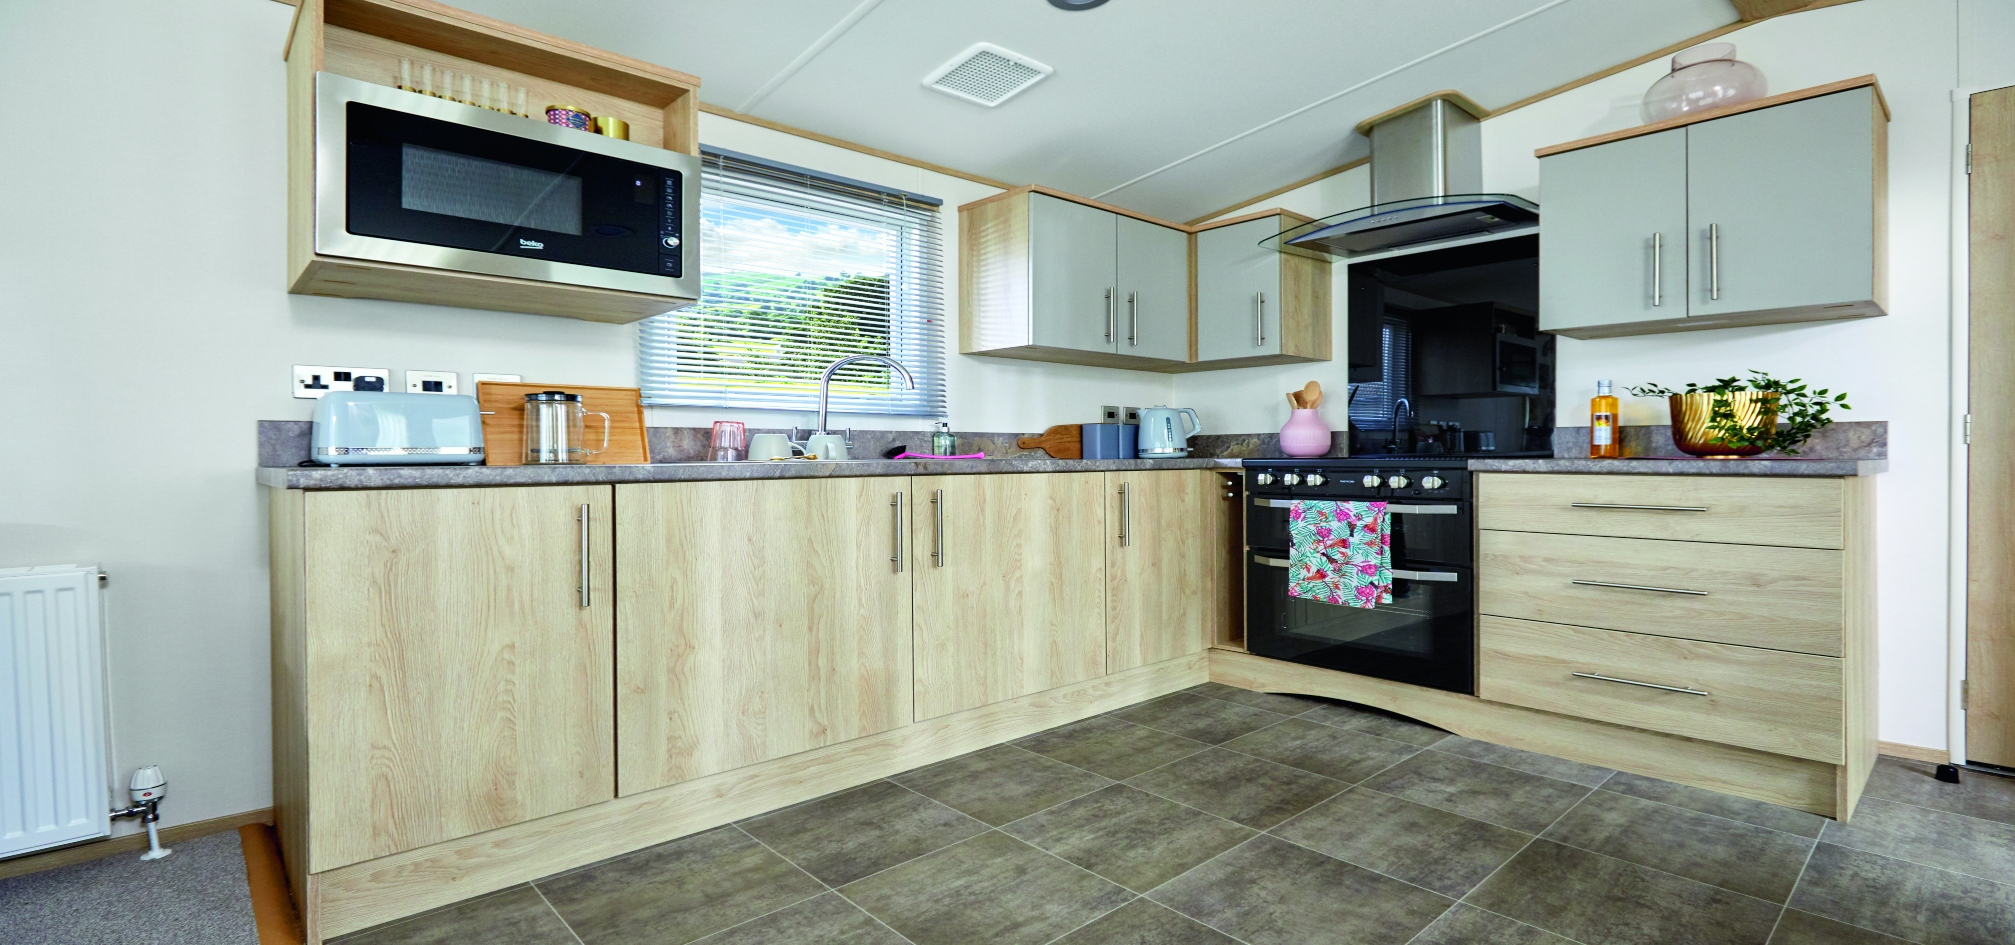 2020-ABI-Beverly-kitchen-resized